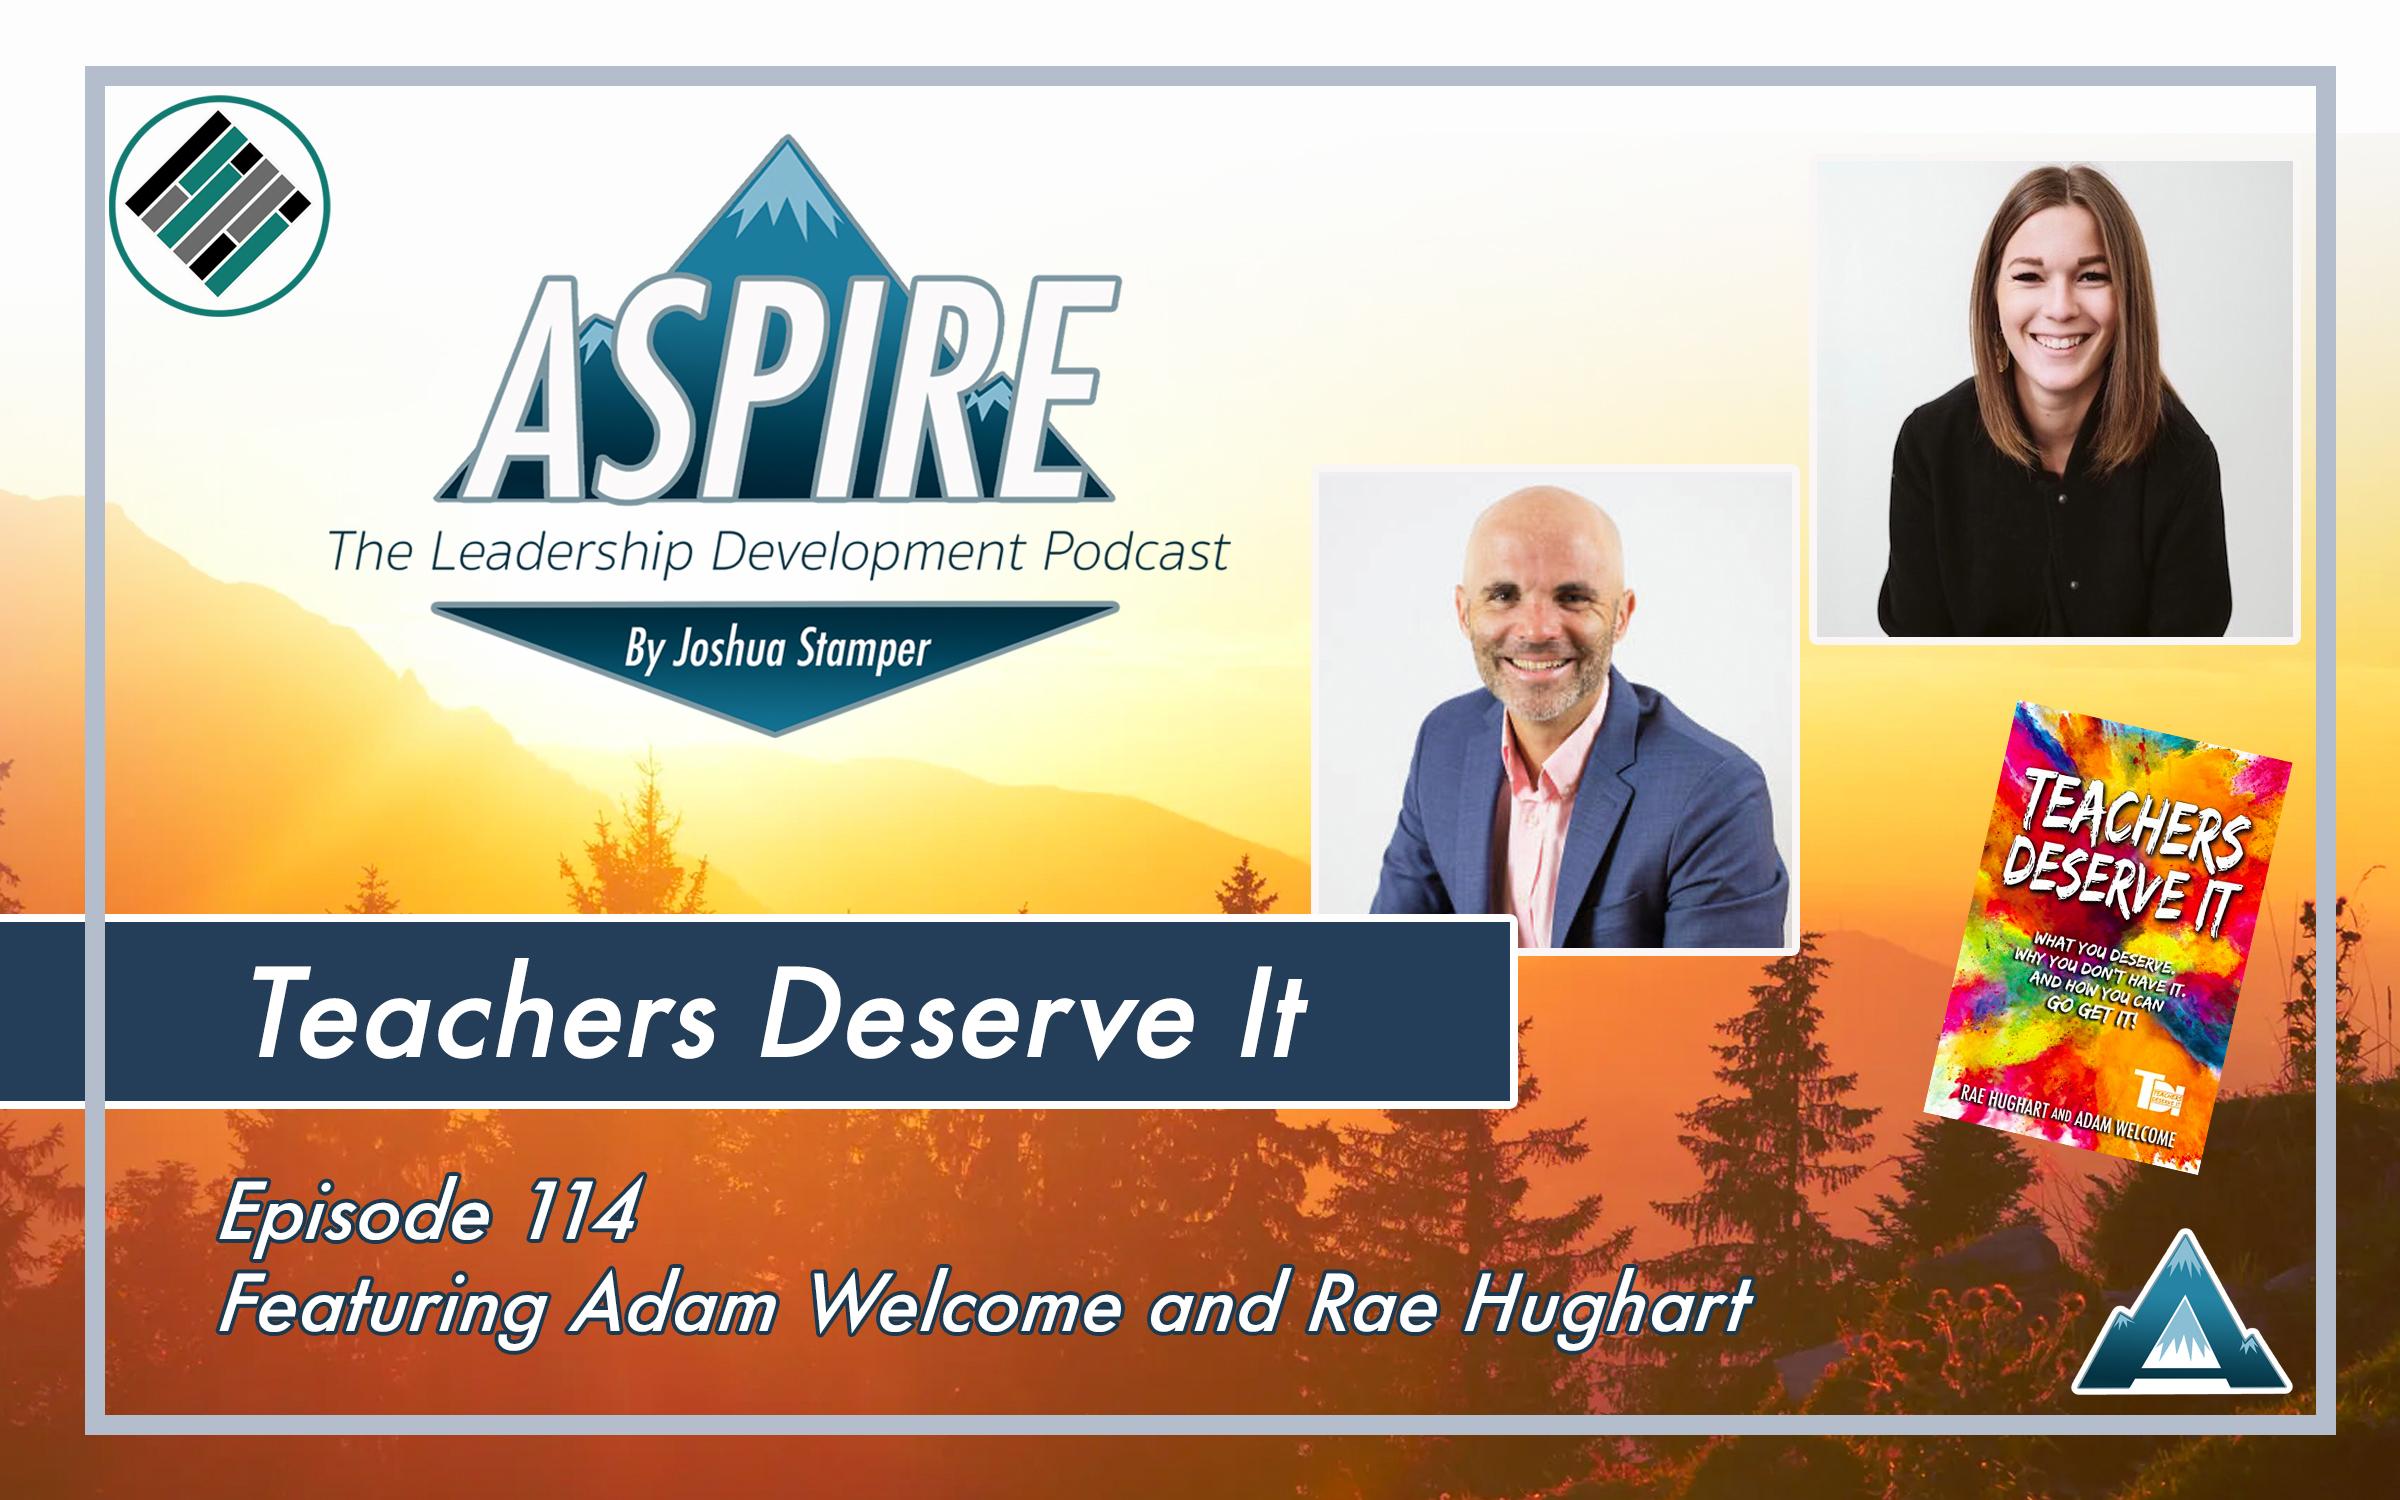 Aspire: The Leadership Development Podcast, Joshua Stamper, Adam Welcome, Rae Hughart, Teachers Deserve It